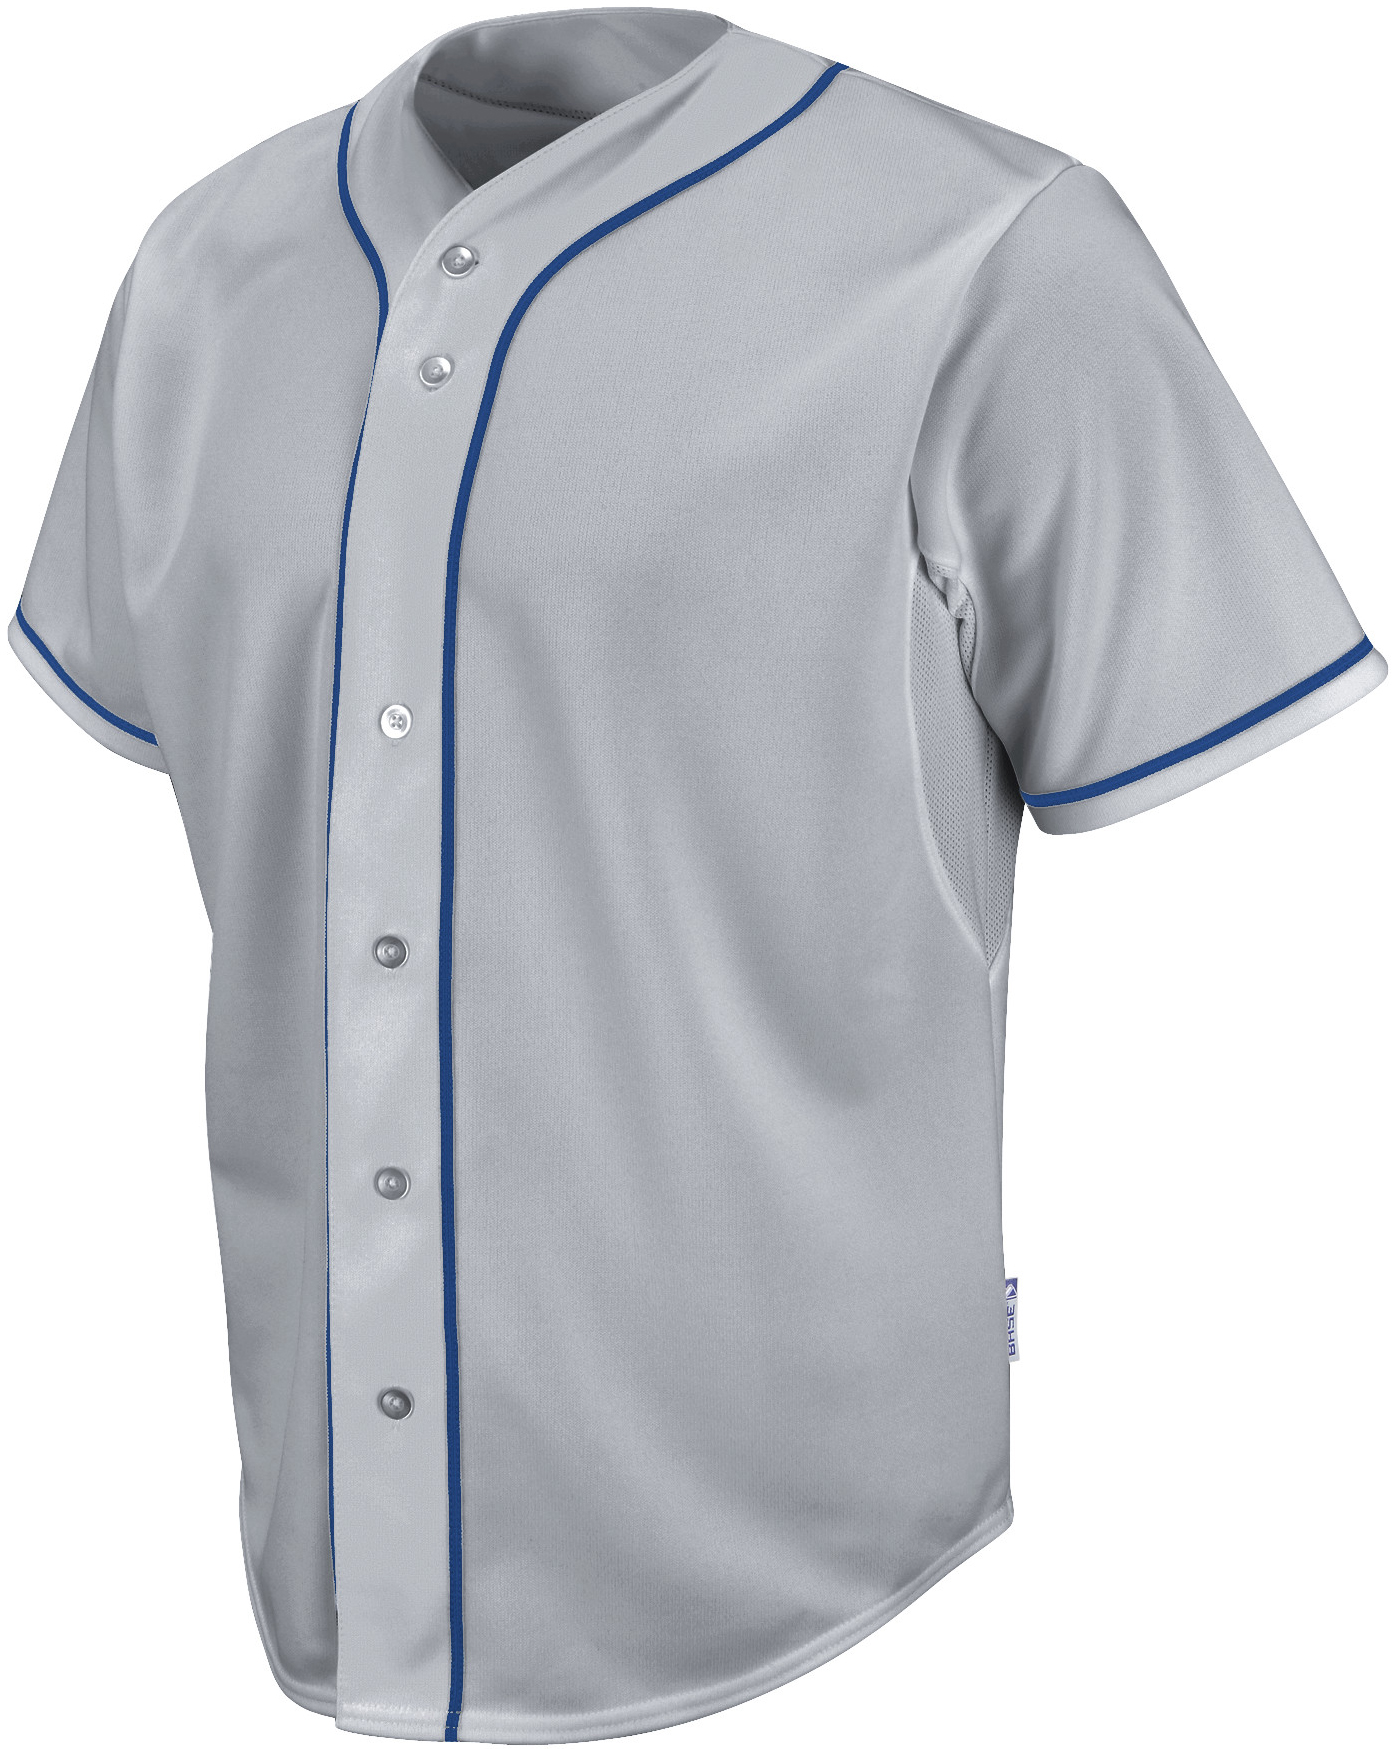 best service 11978 a955f Plain Baseball Shirts Uk